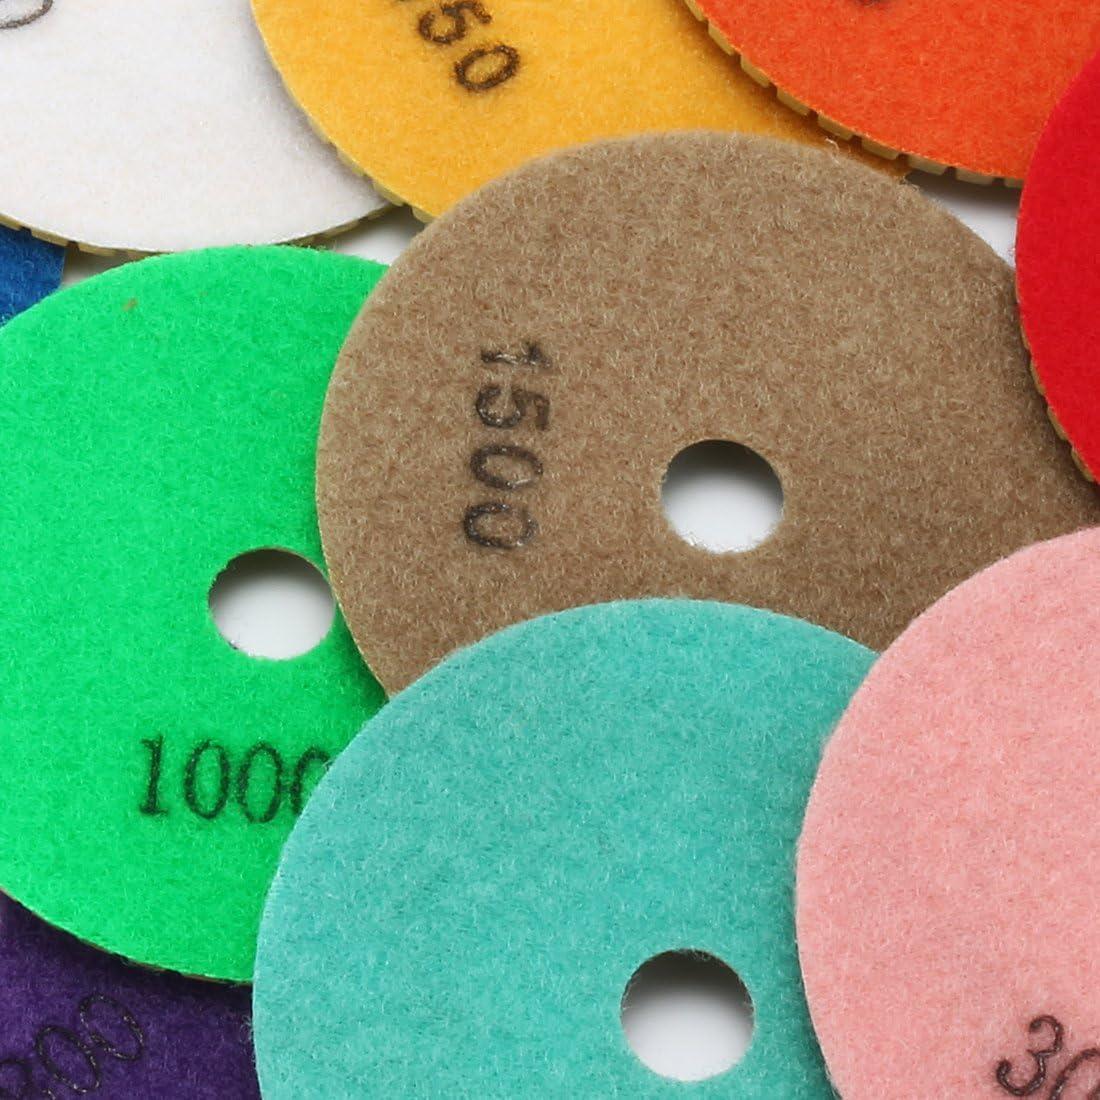 sourcing map 4-inch Diamond Wet Polishing Sanding Grinding Pads Grit 500 10pcs w Rubber Backer Pad